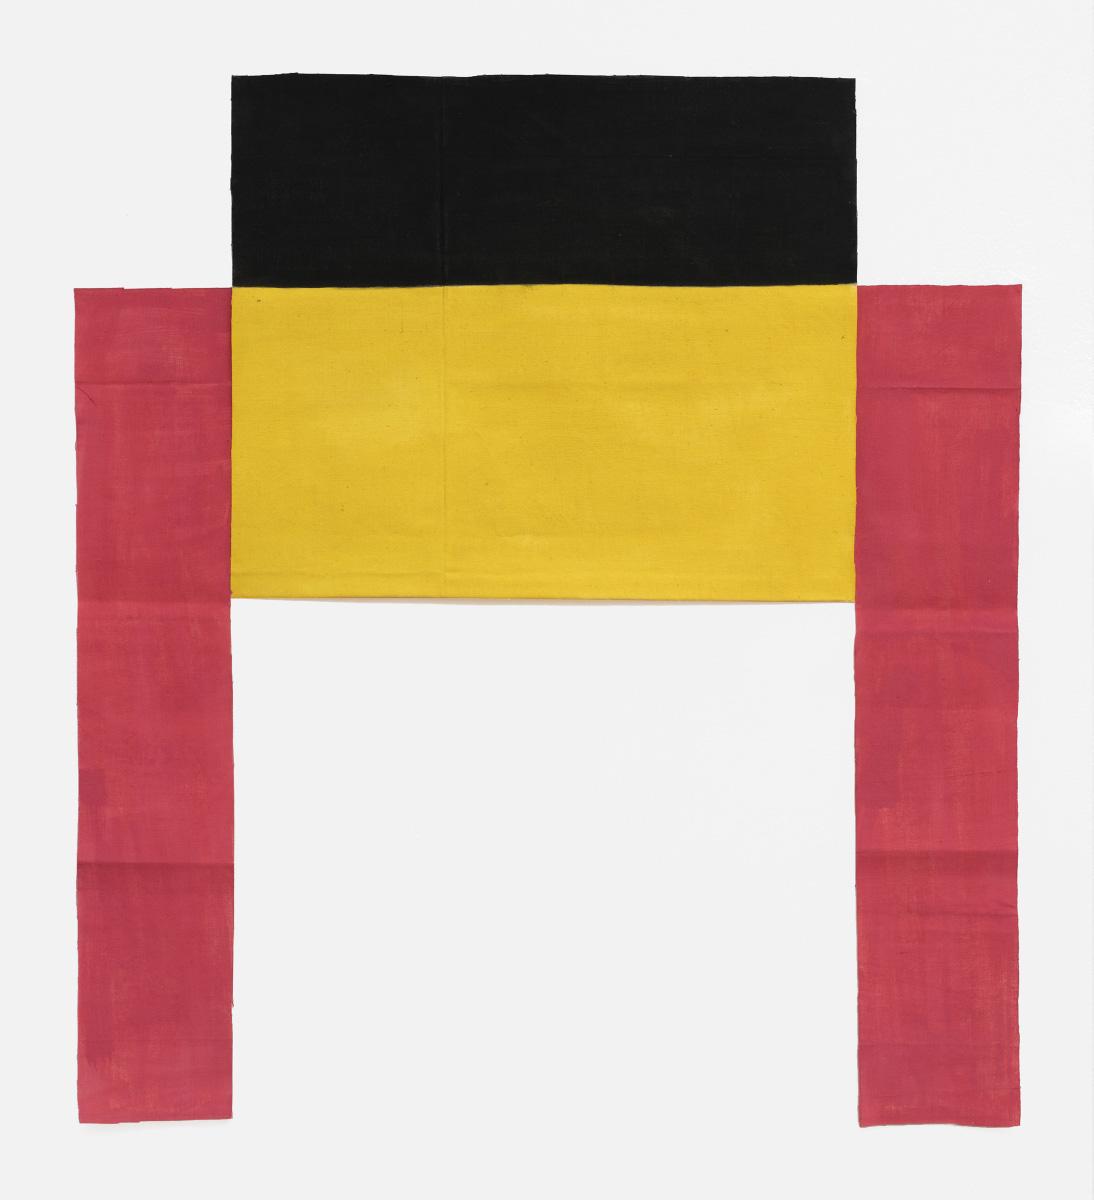 Louis Cane (b. 1943), Toile découpée (Cut Out Canvas), 1972, Acrylic on fabric, 98 x 91 cm/38.58 x 35.83 in.Image courtesy of Ceysson & Bé